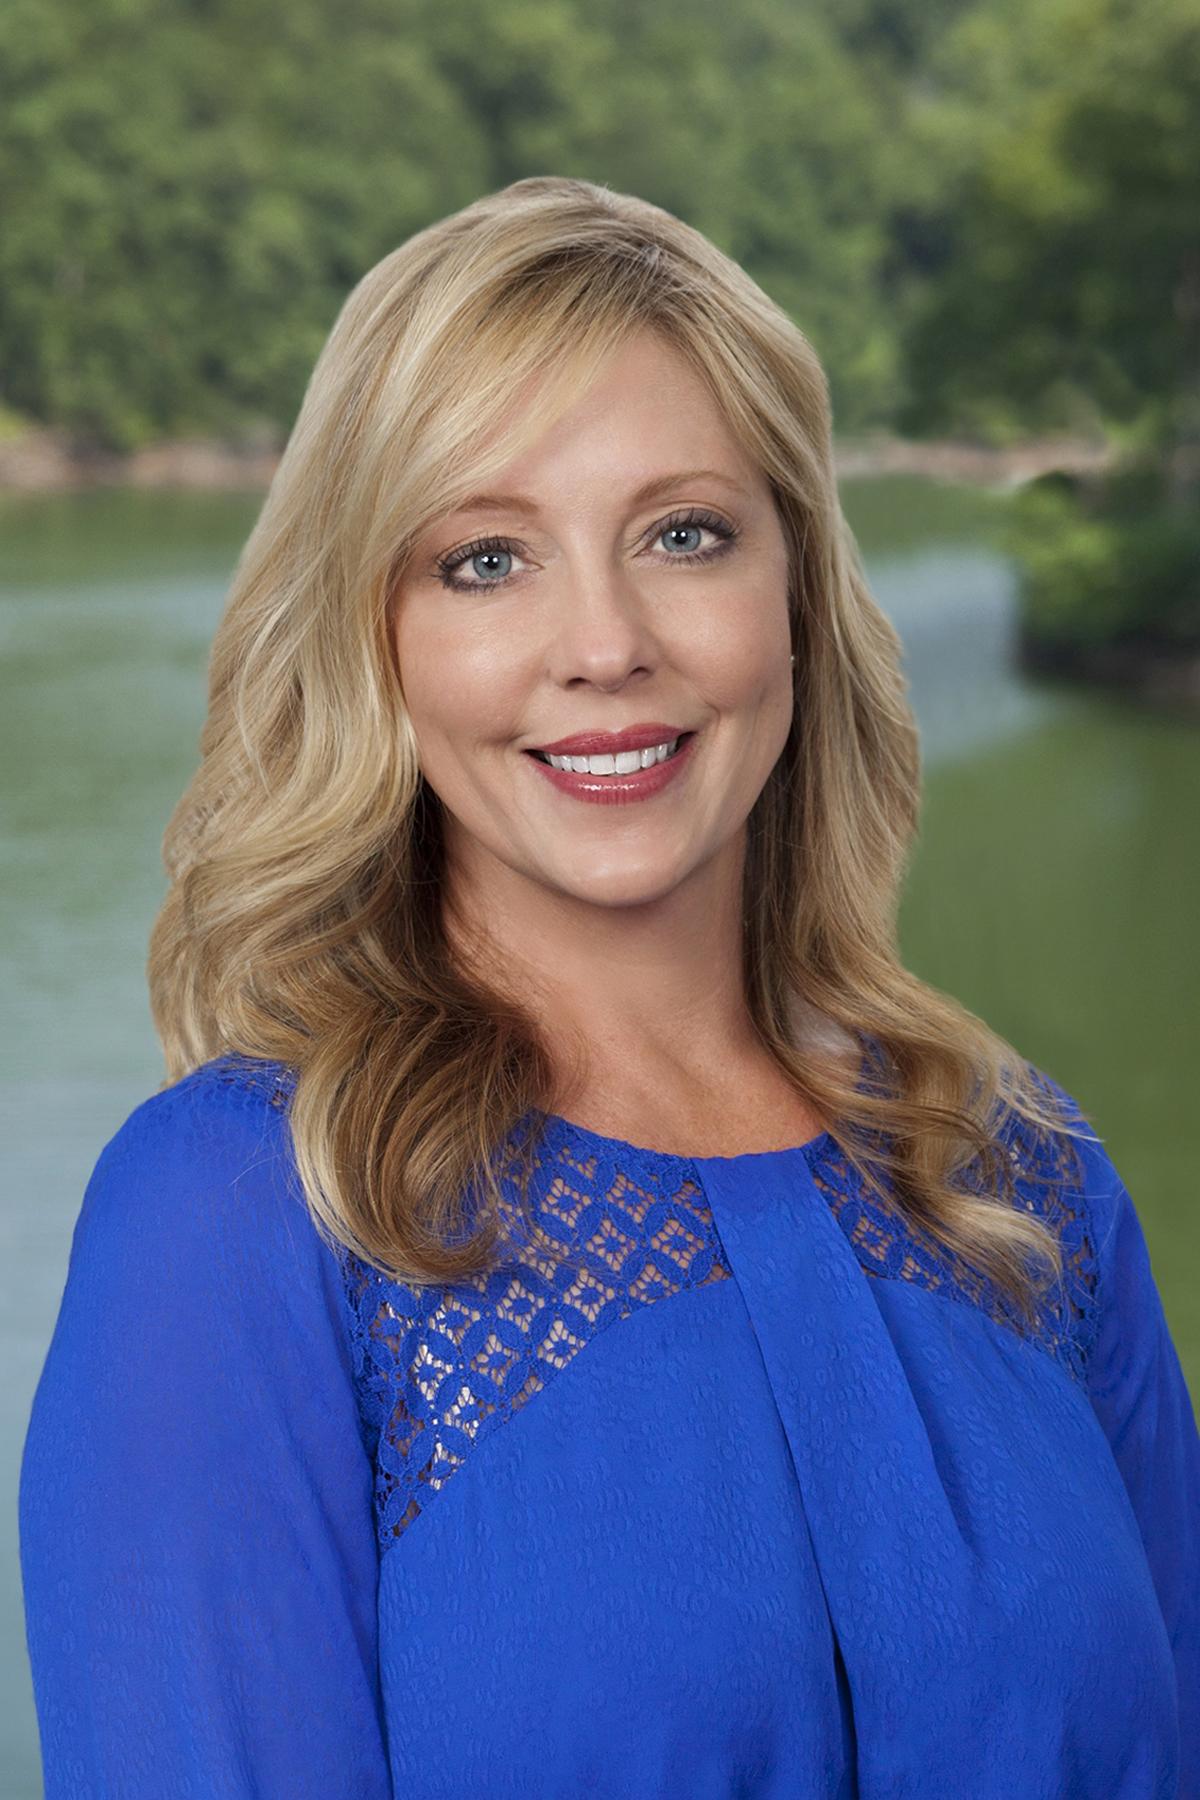 Stephanie Gillespie, 770-654-4161